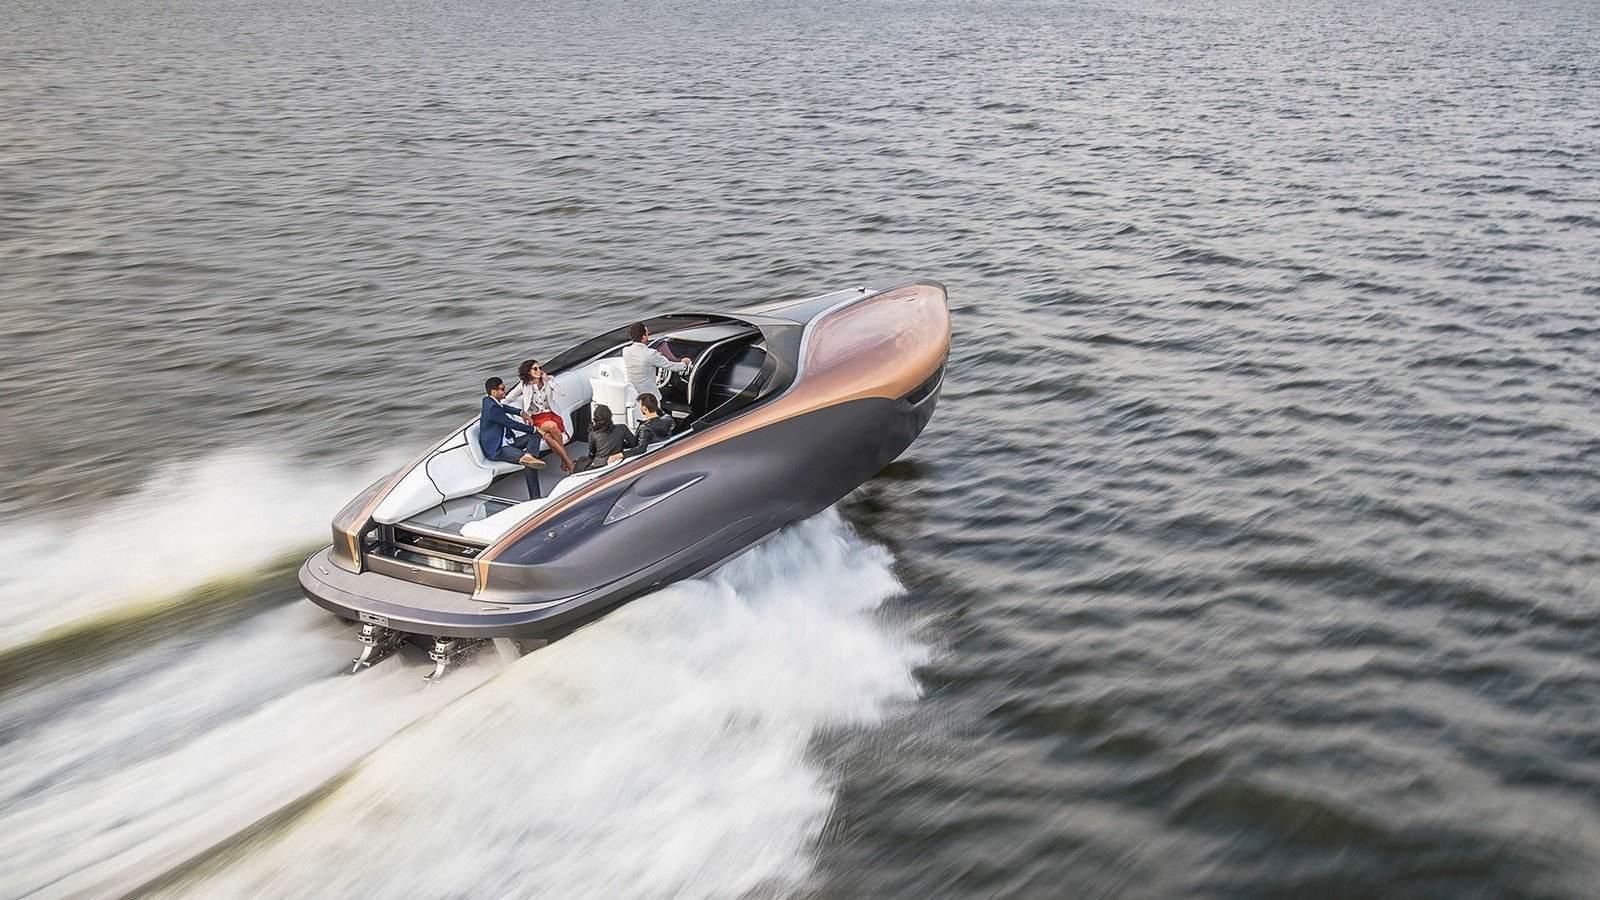 2017-lexus-sports-yacht-concept-gallery-04-1920x1080_tcm-3113-872717-copy